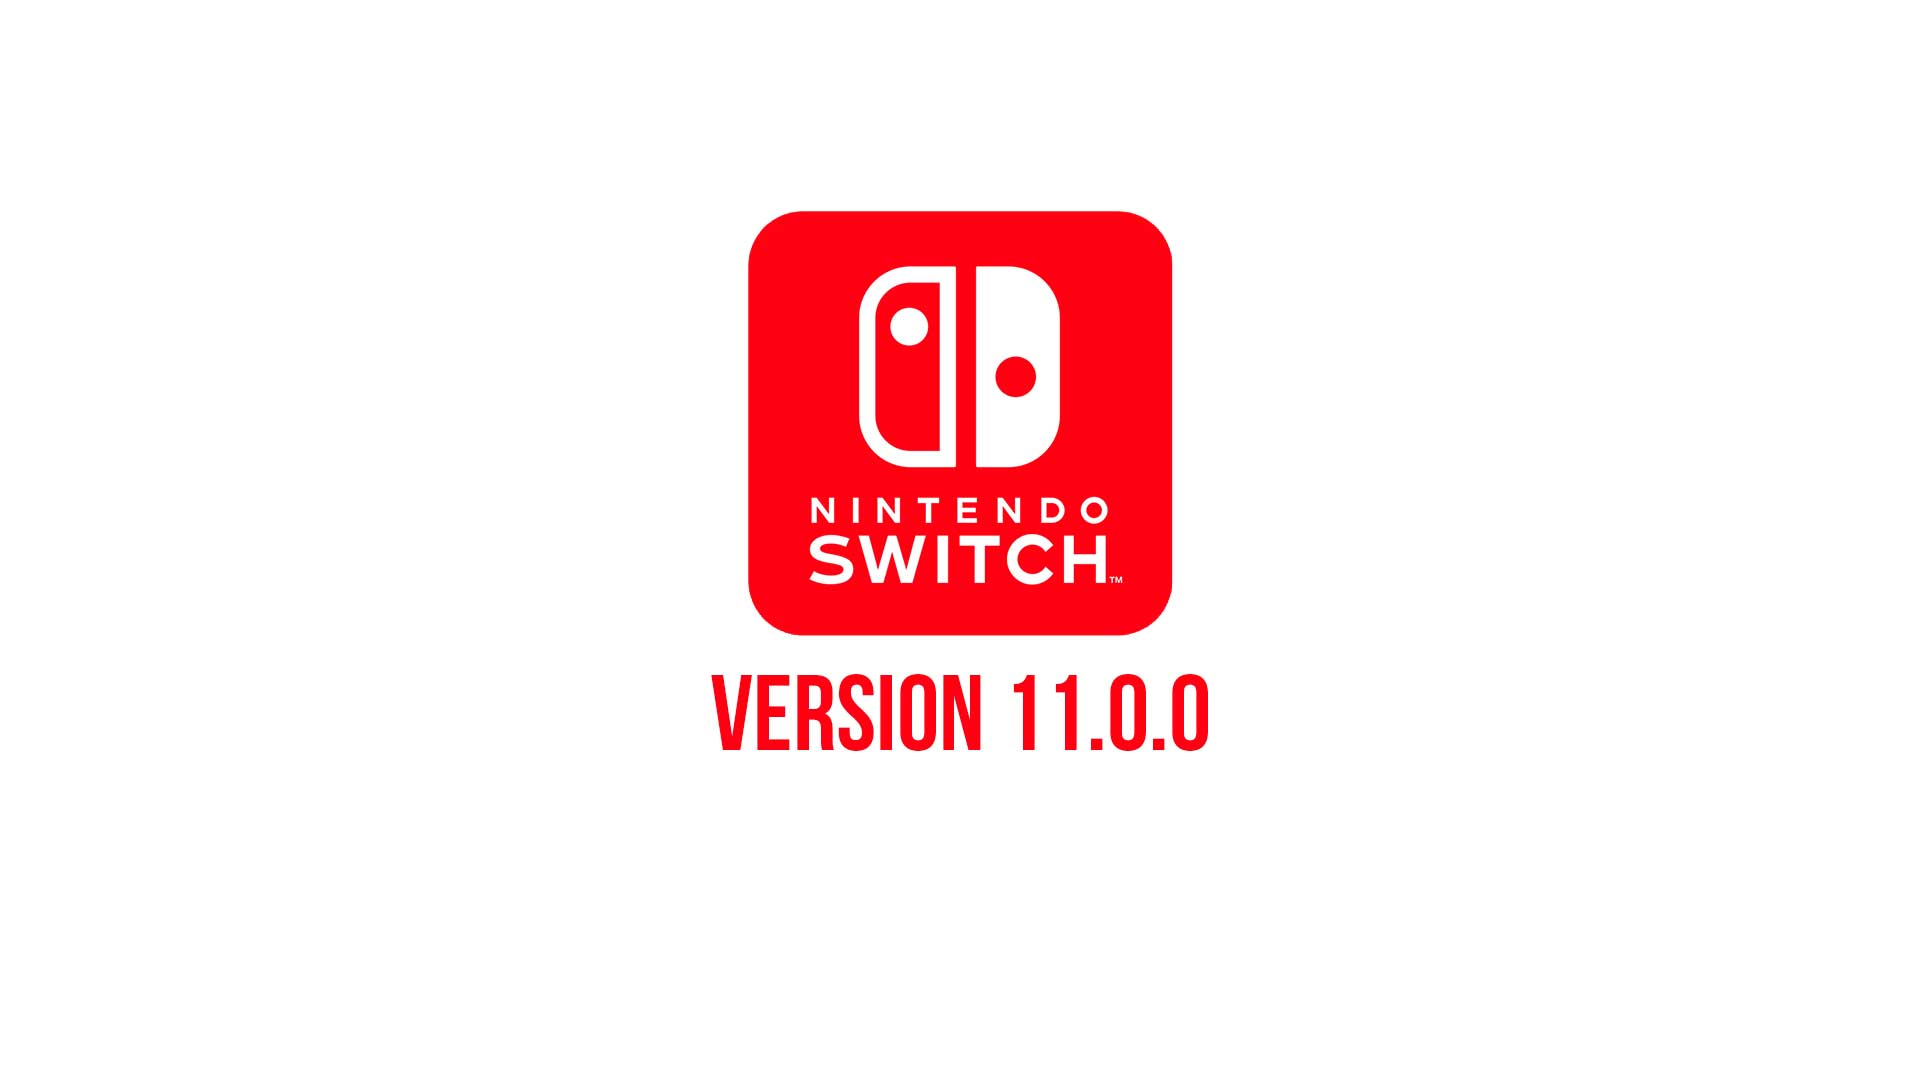 nintendo switch version 11 0 0